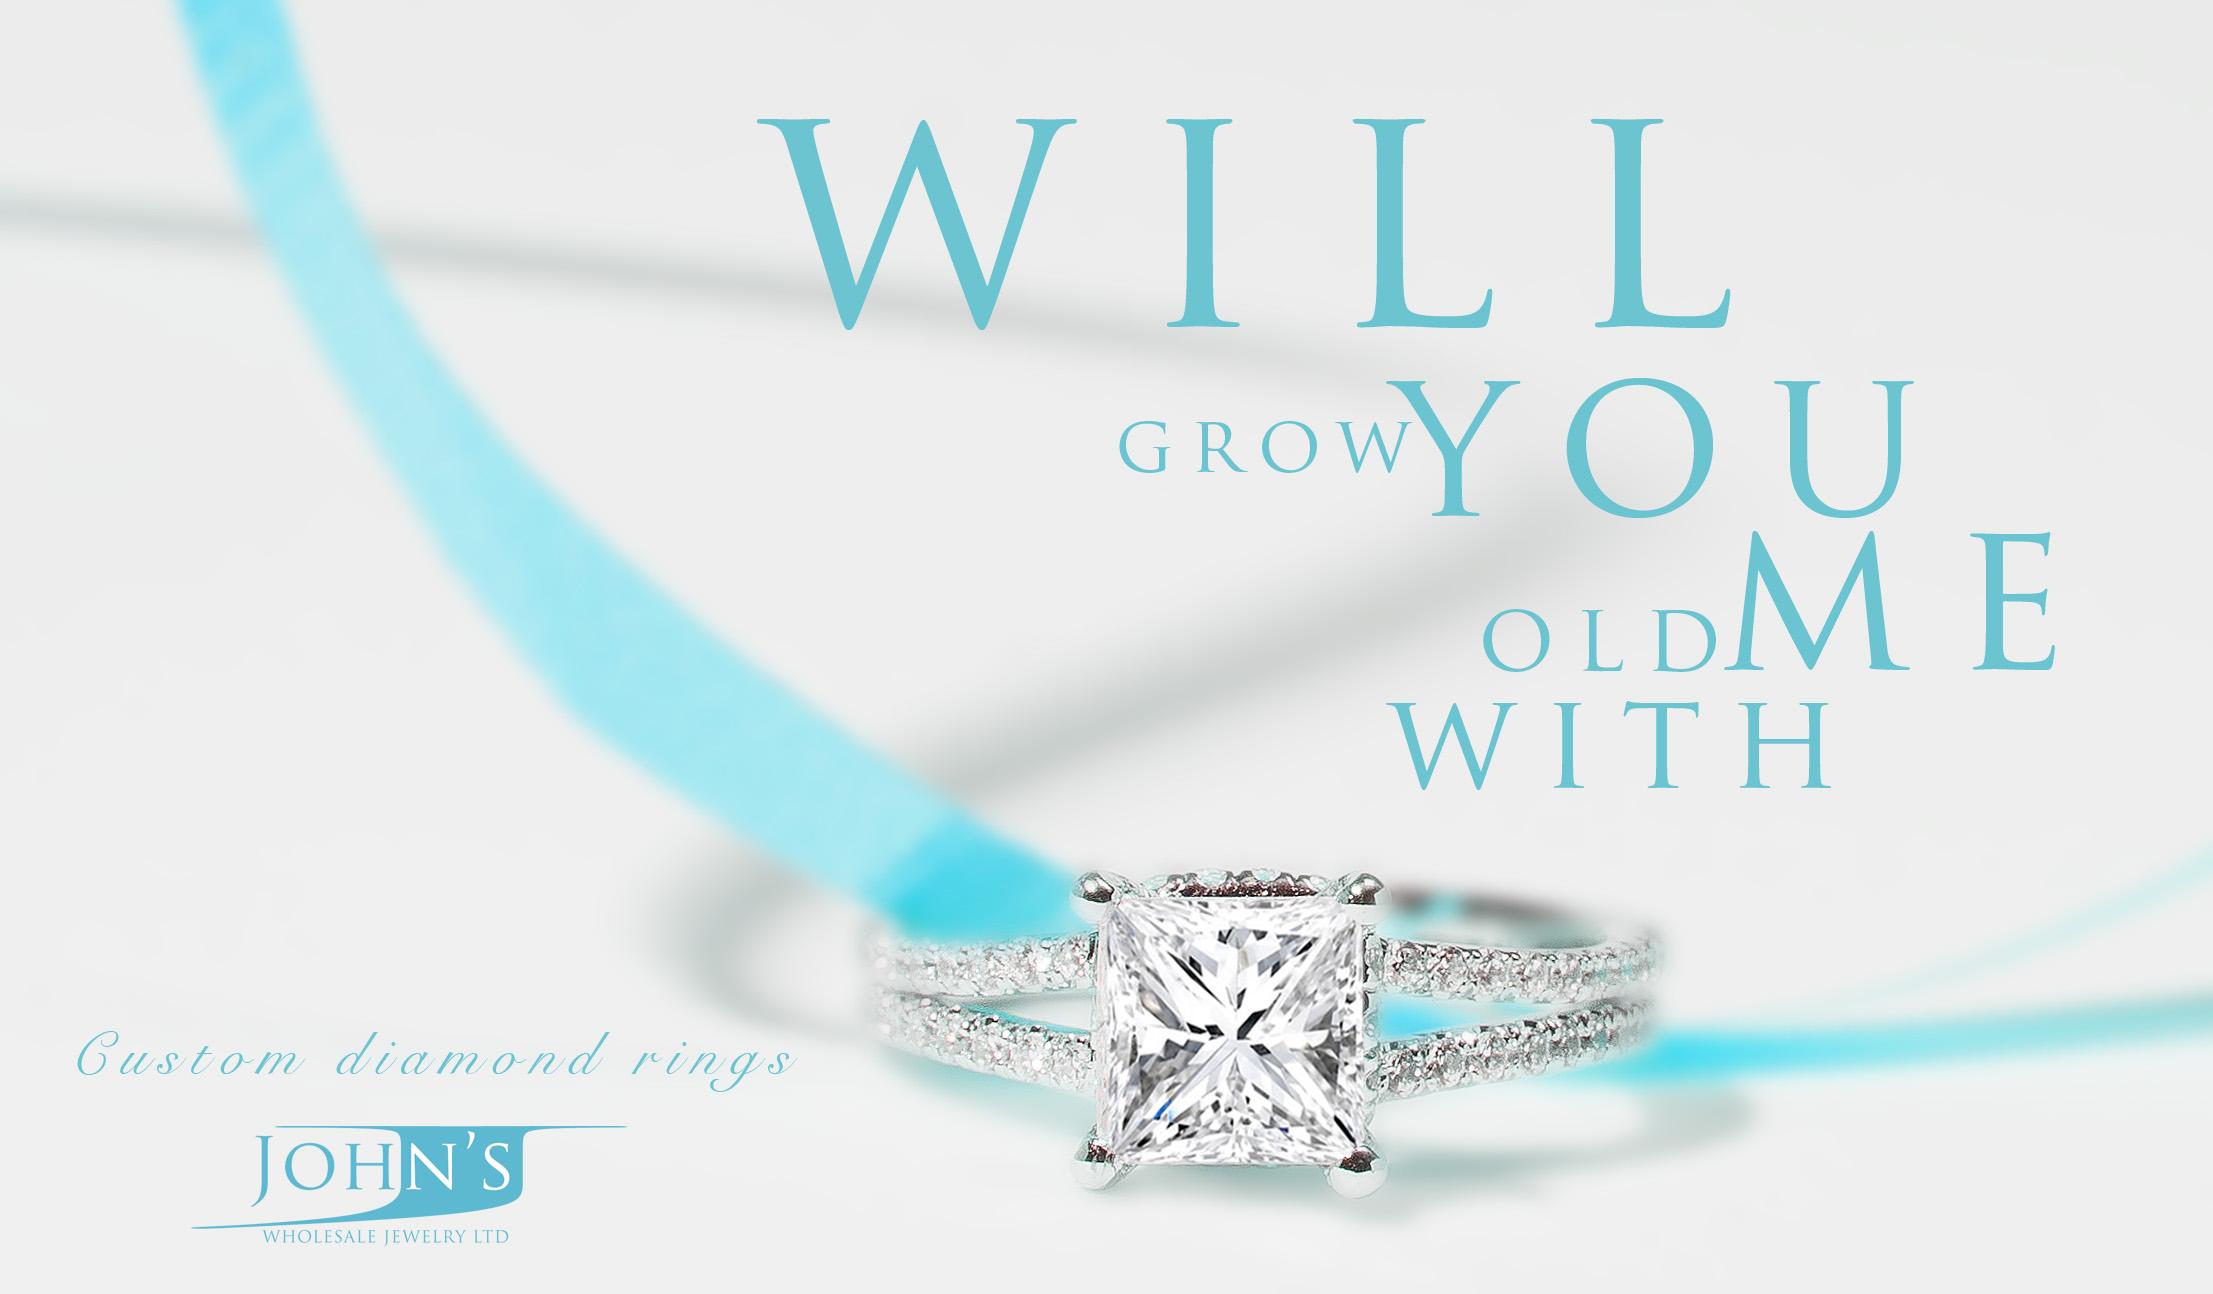 John S Whole Jewelry